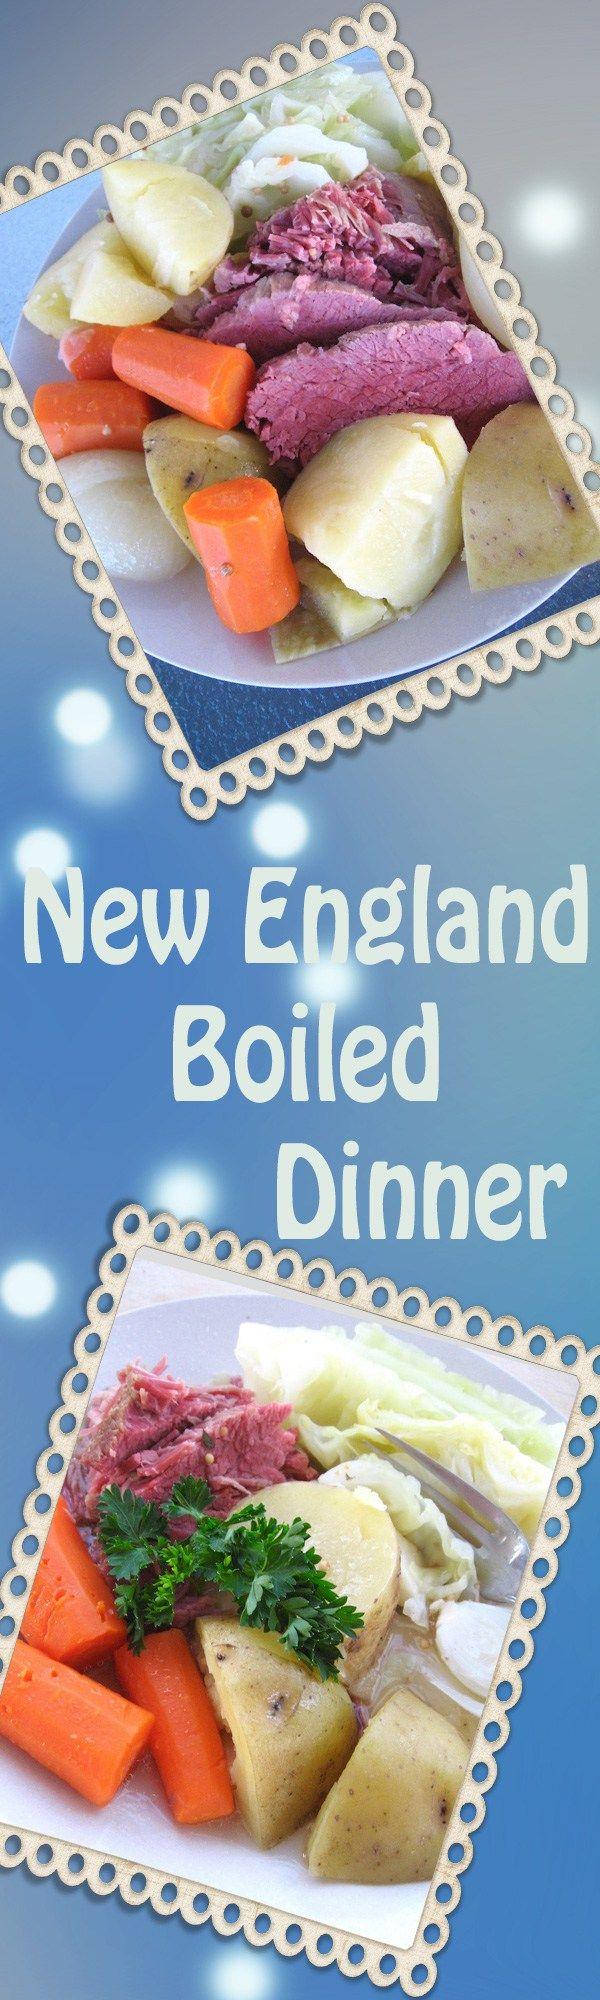 1000 ideas about boiled dinner on pinterest veggies. Black Bedroom Furniture Sets. Home Design Ideas